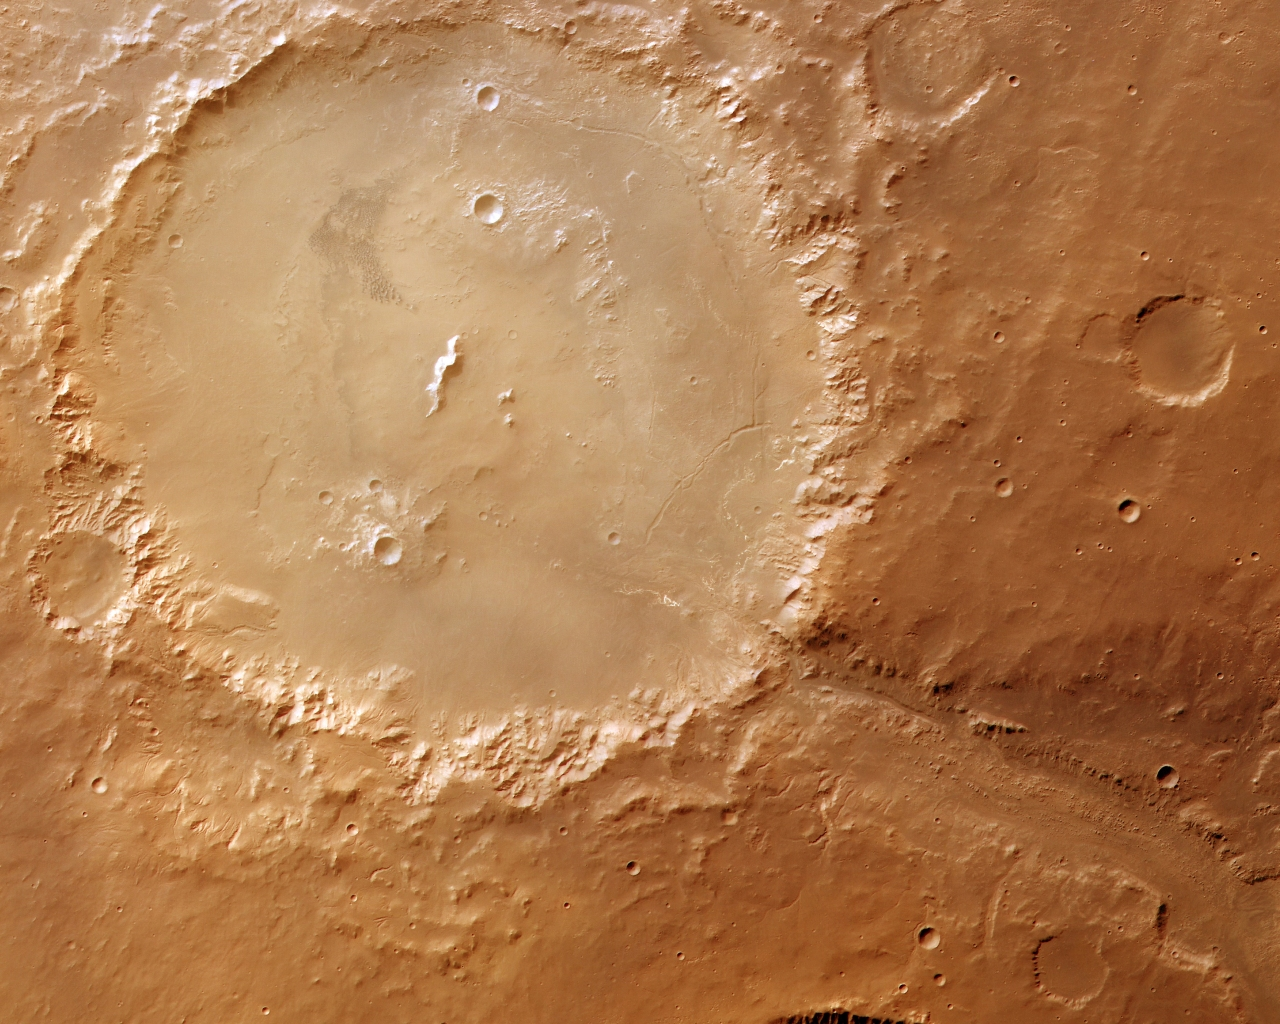 1567219138966-Crater-Holden_wallpaper.jpg